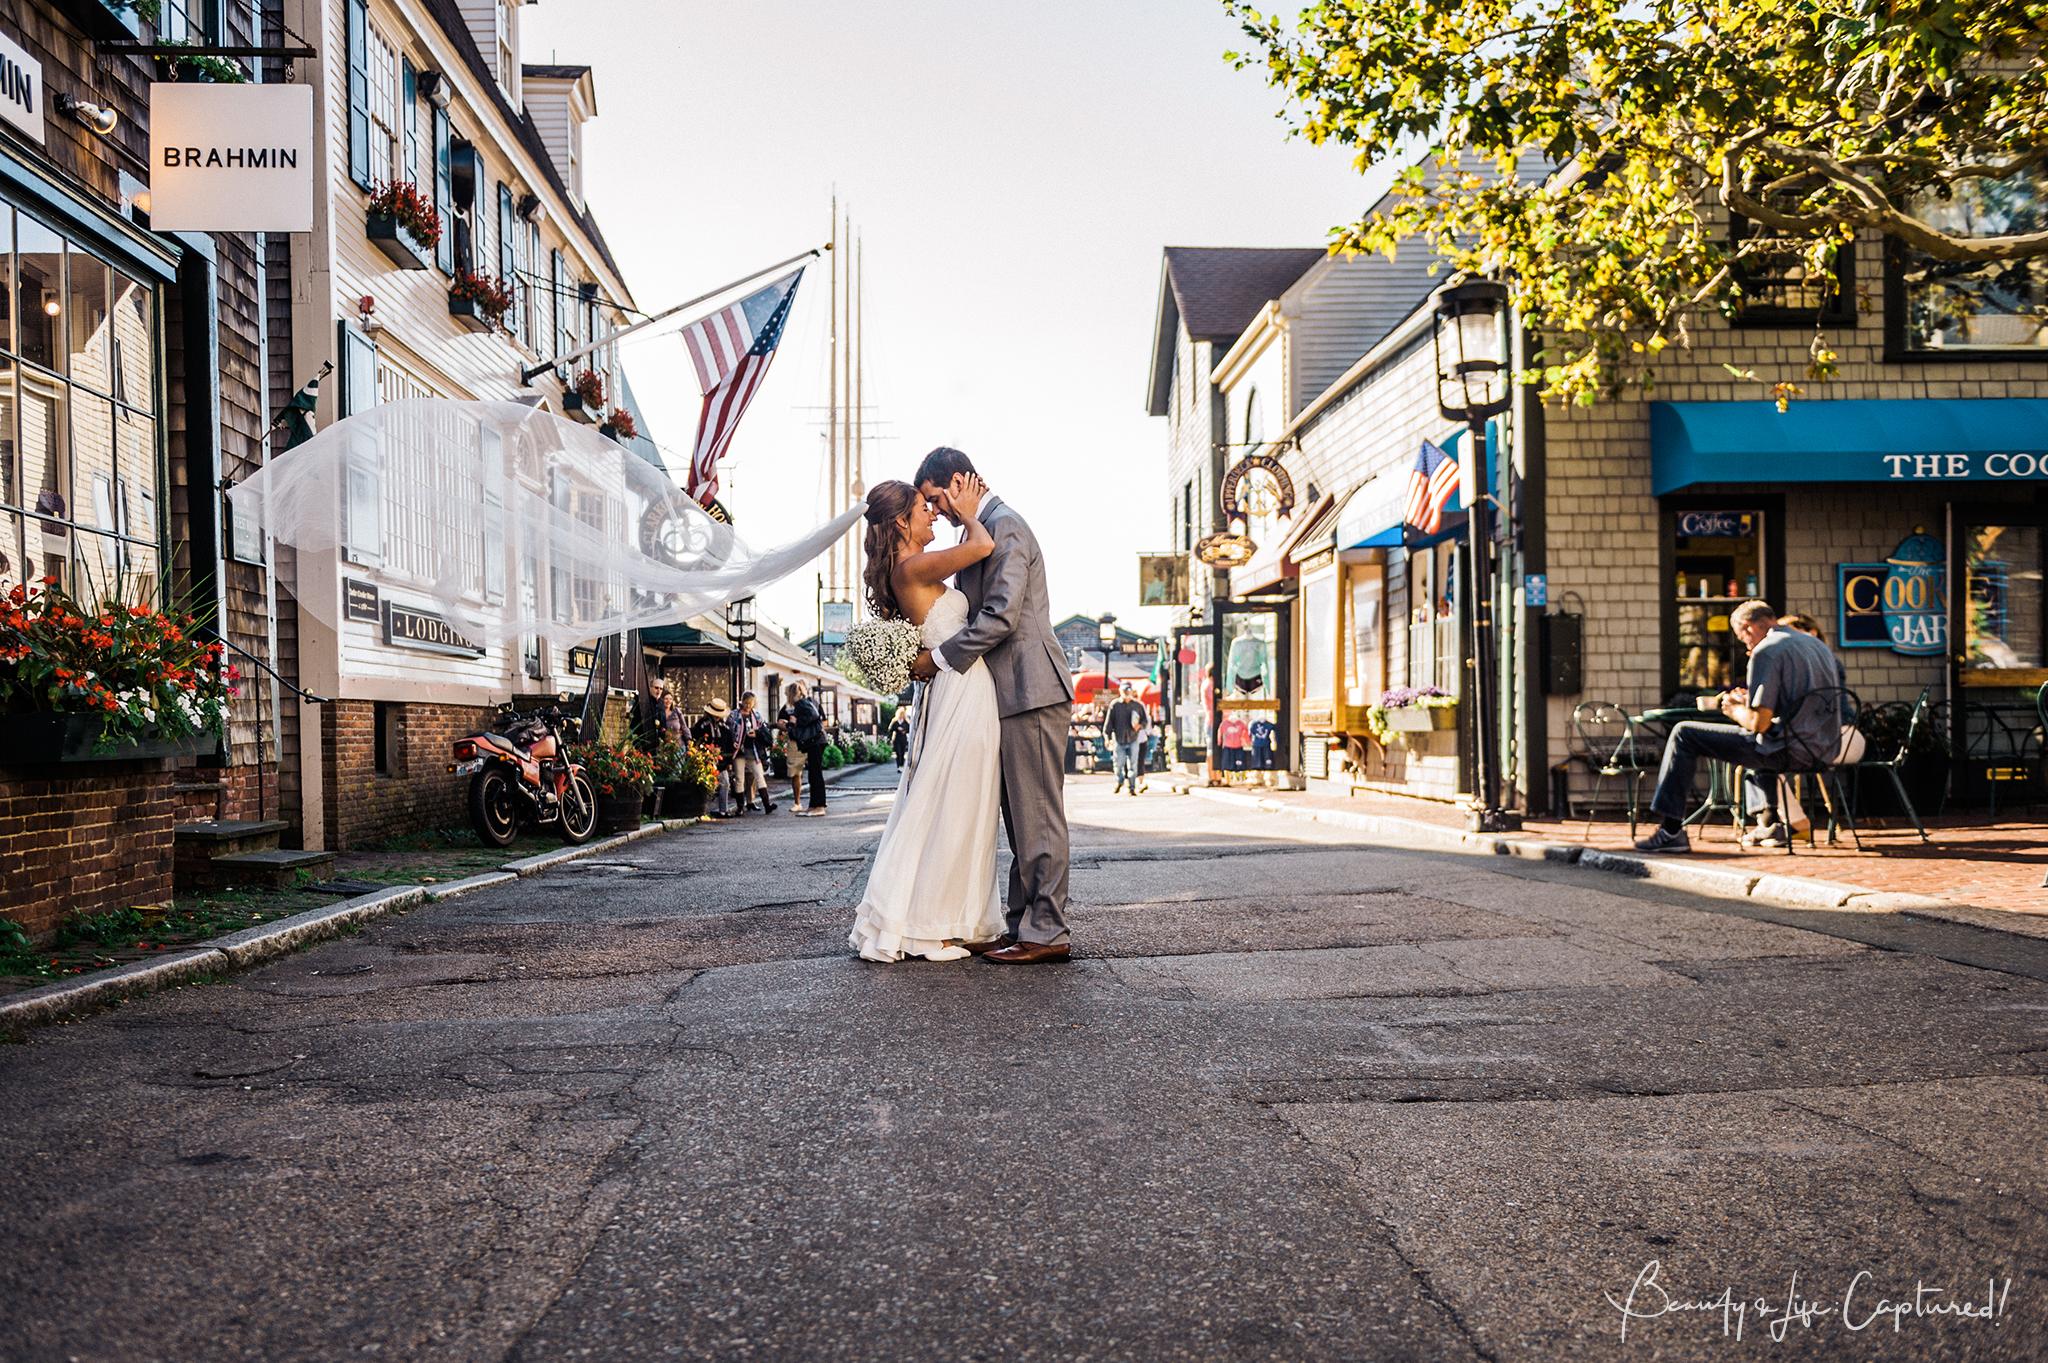 Beauty_and_Life_Captured_Athena_Wedding-7.jpg